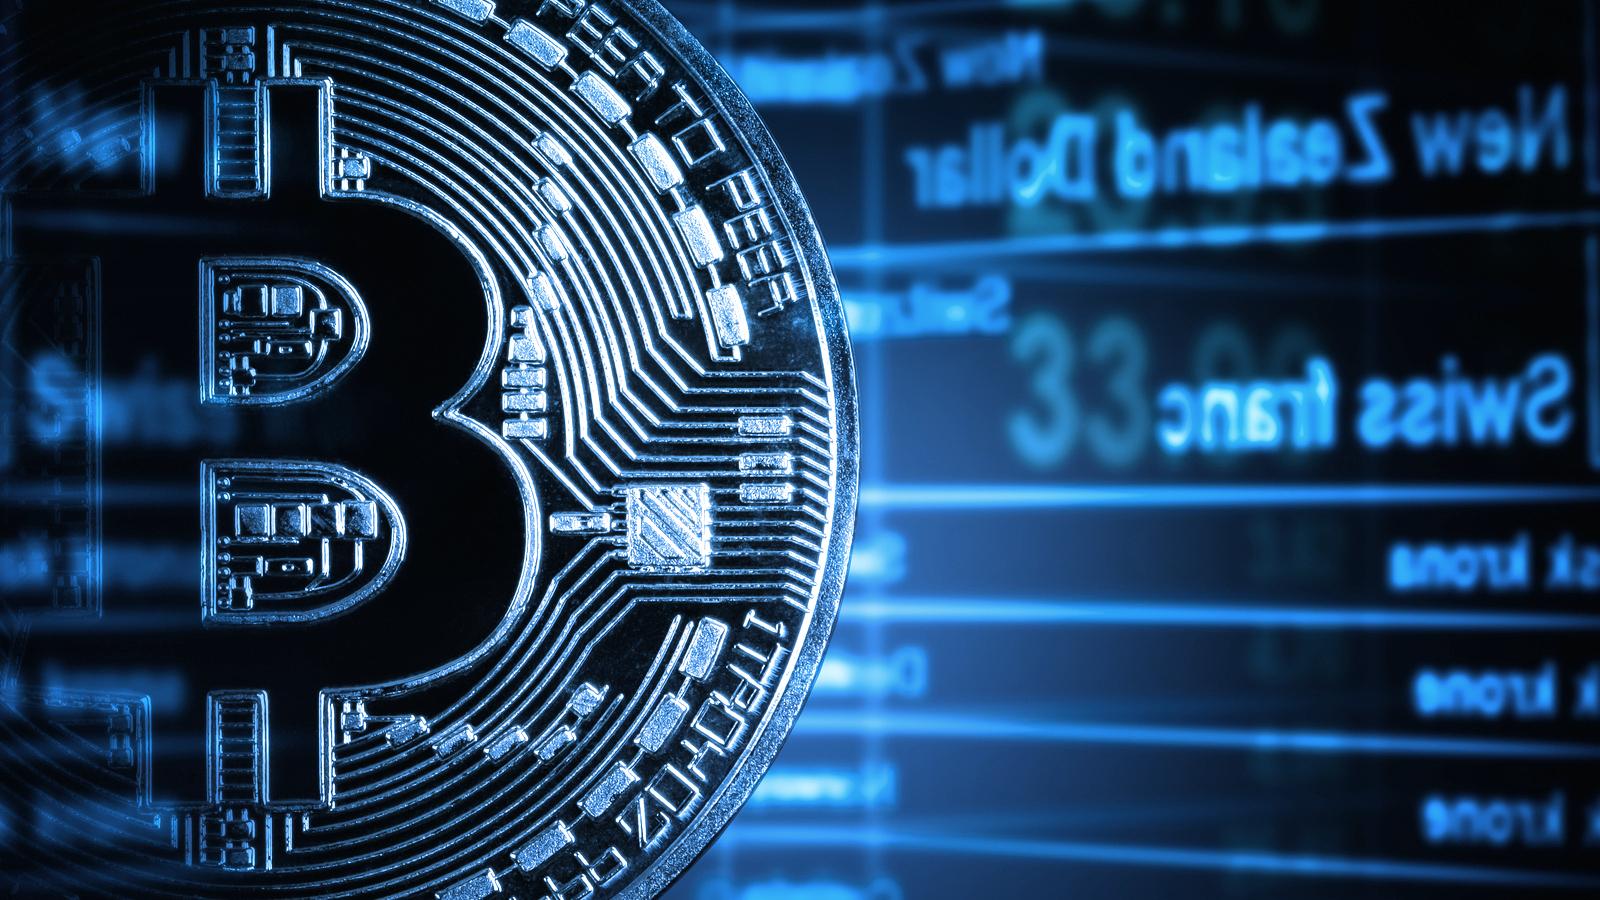 $400bn Wealth Manager Neuberger Berman Green-Lights Bitcoin Investments